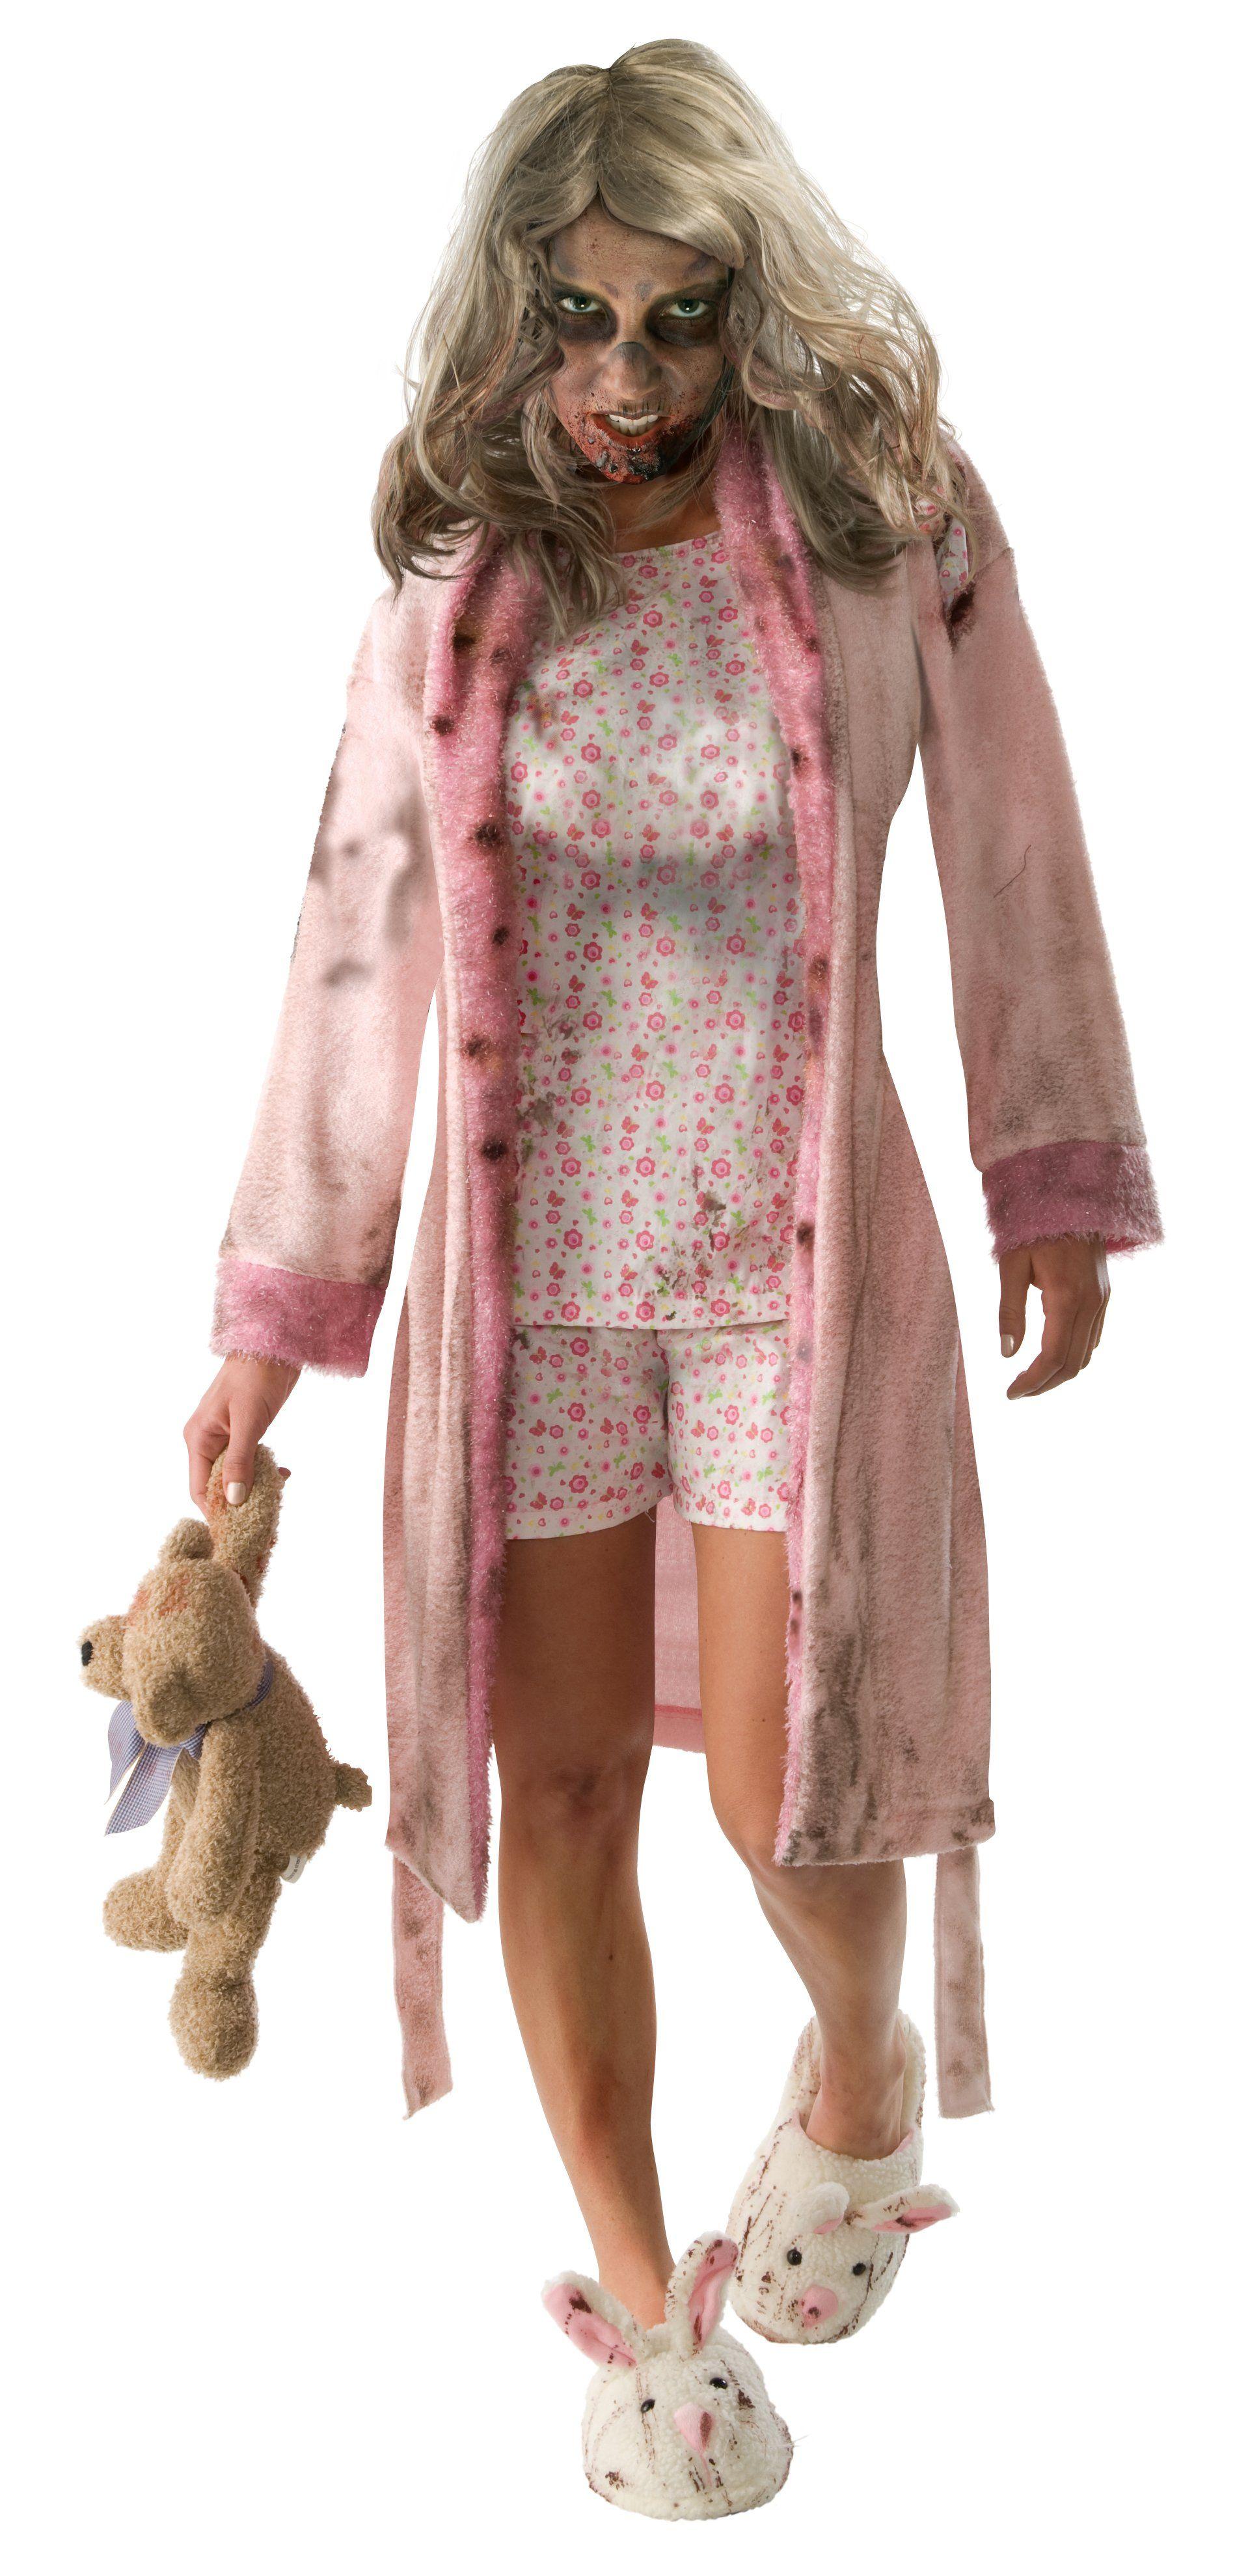 The Walking Dead - Pajama Zombie Teen Costume